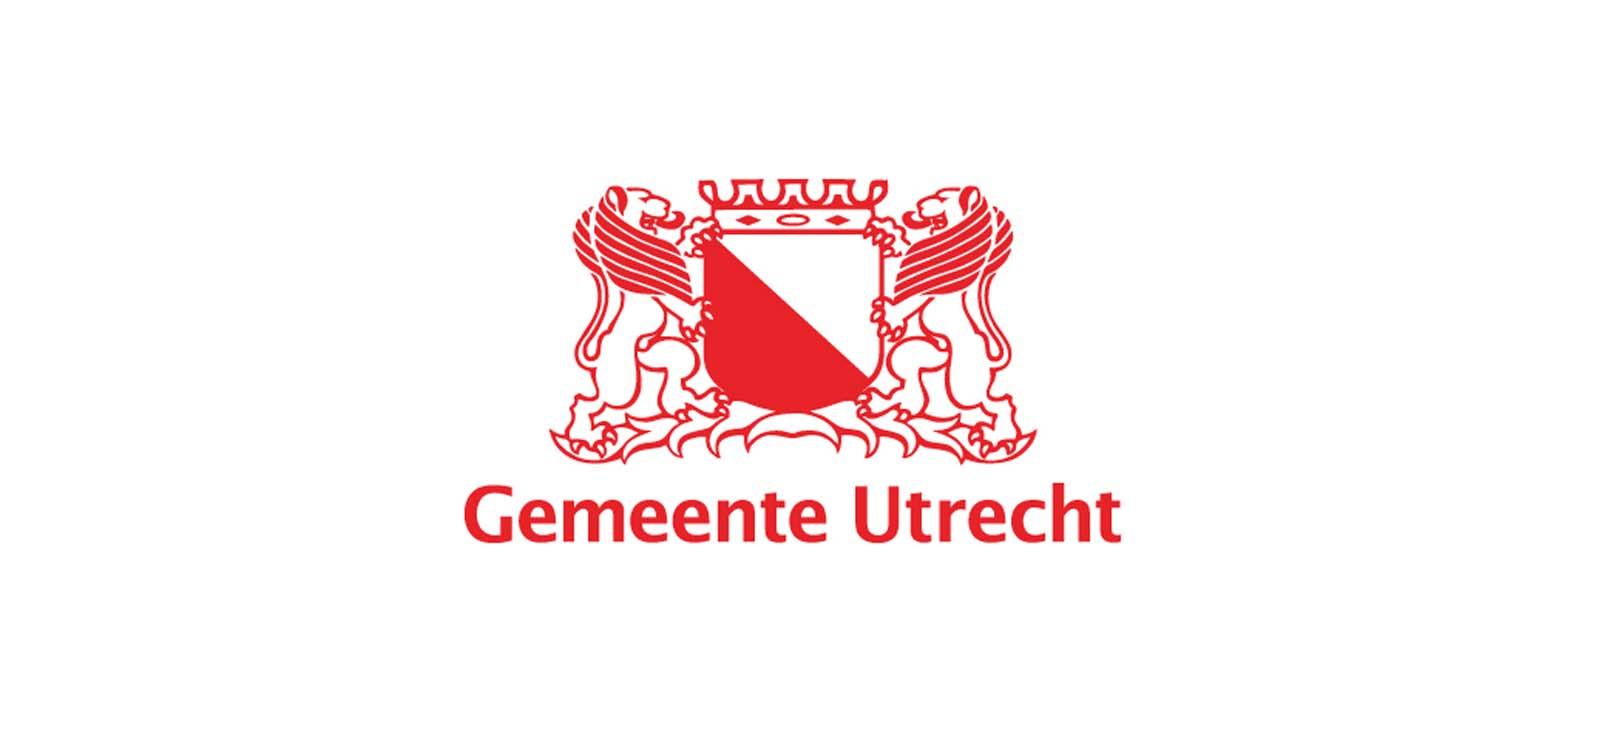 Gemeente Utrecht - Participant van de Green Business Club Utrecht